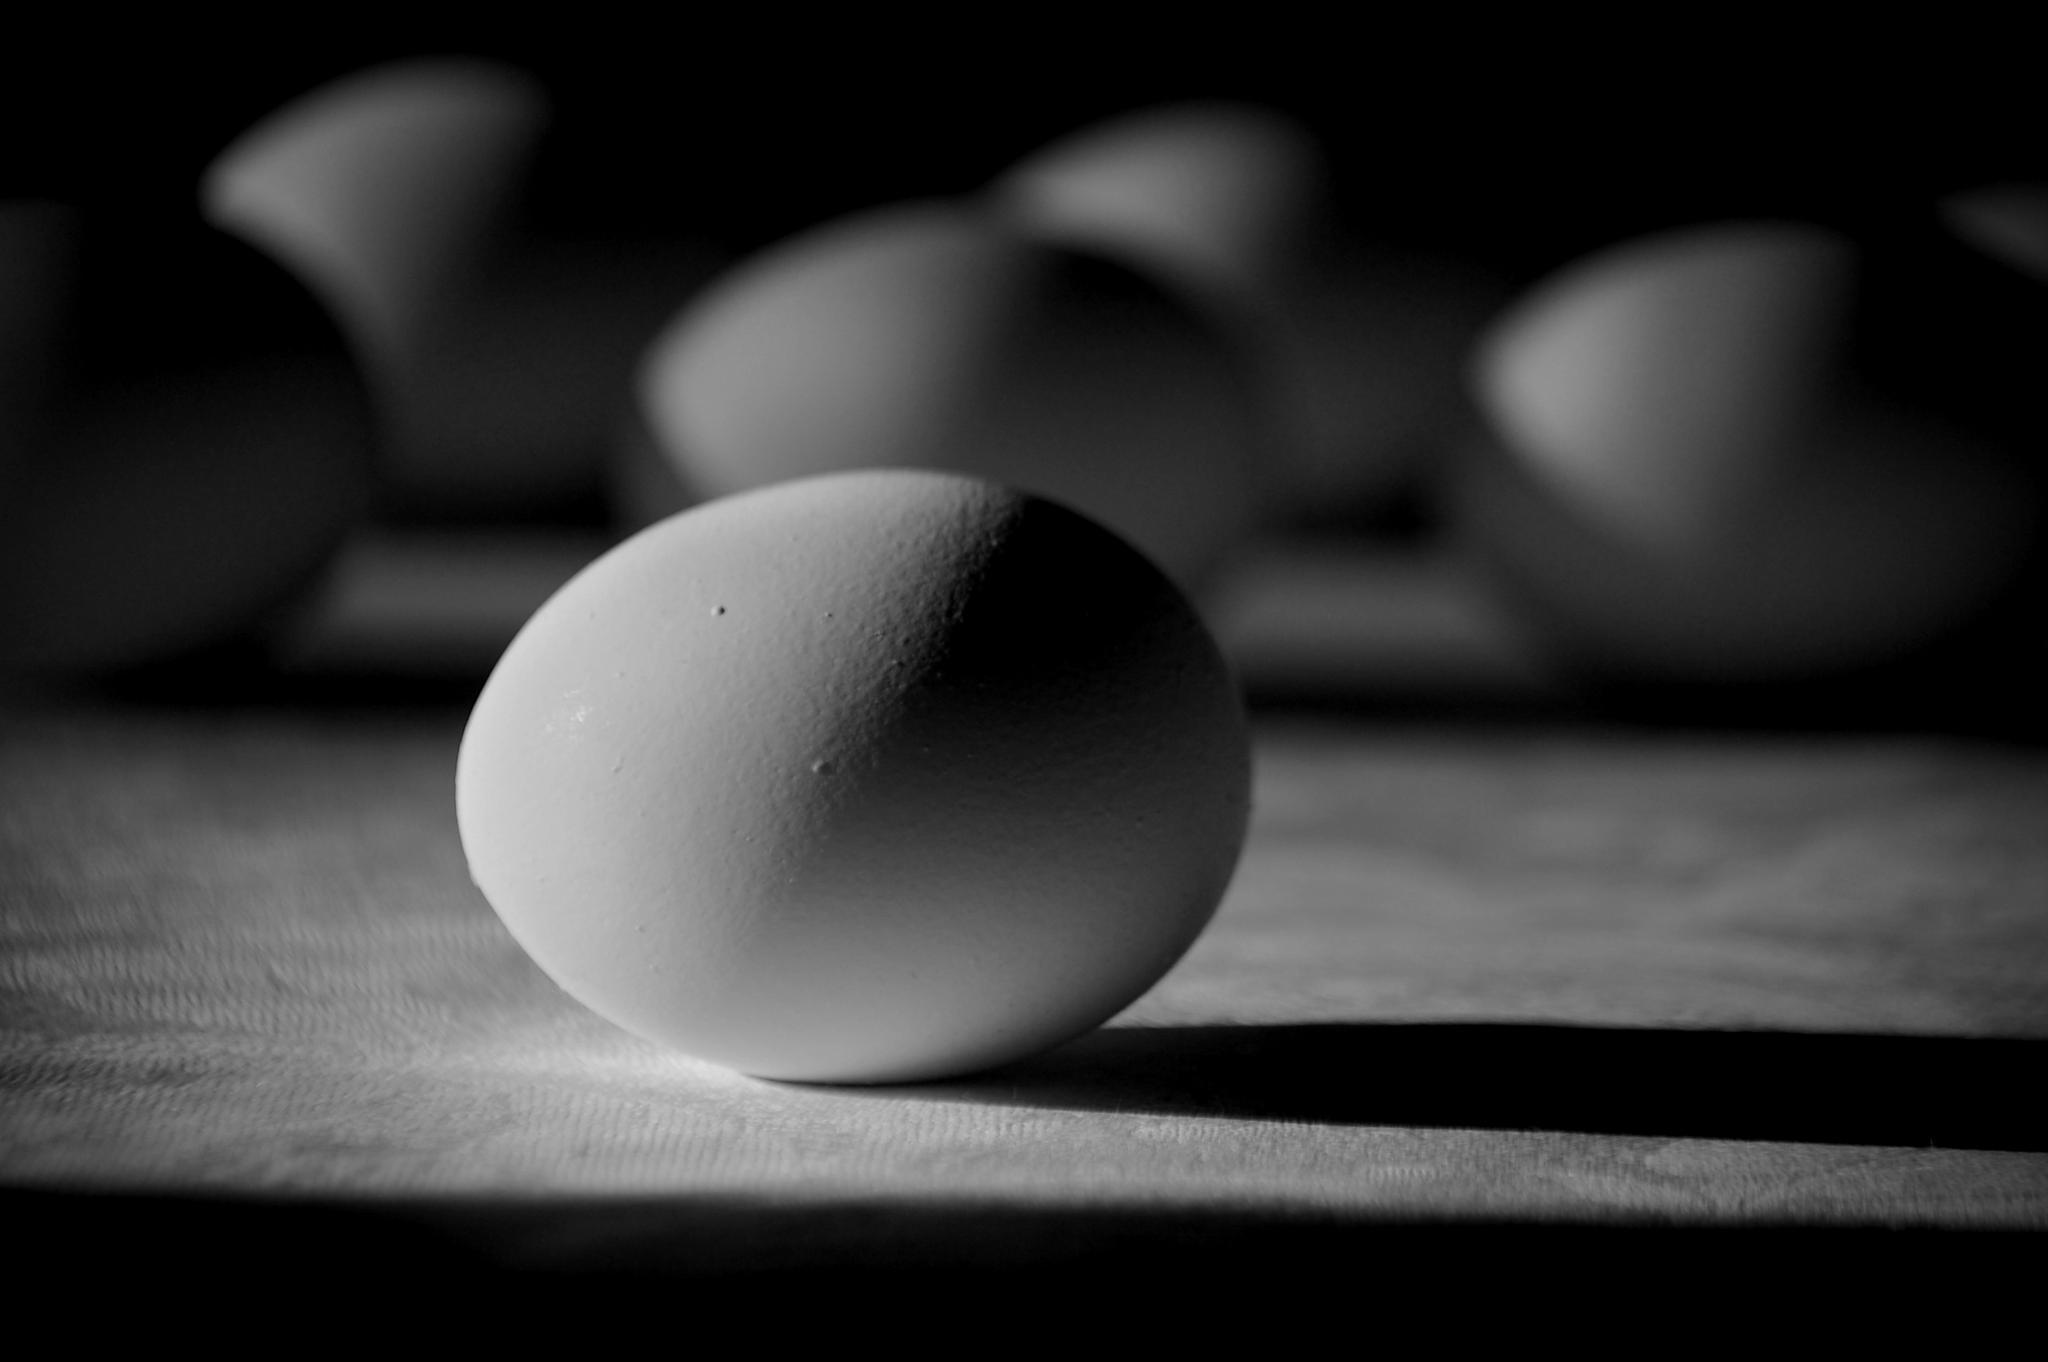 Egg by KristinaW